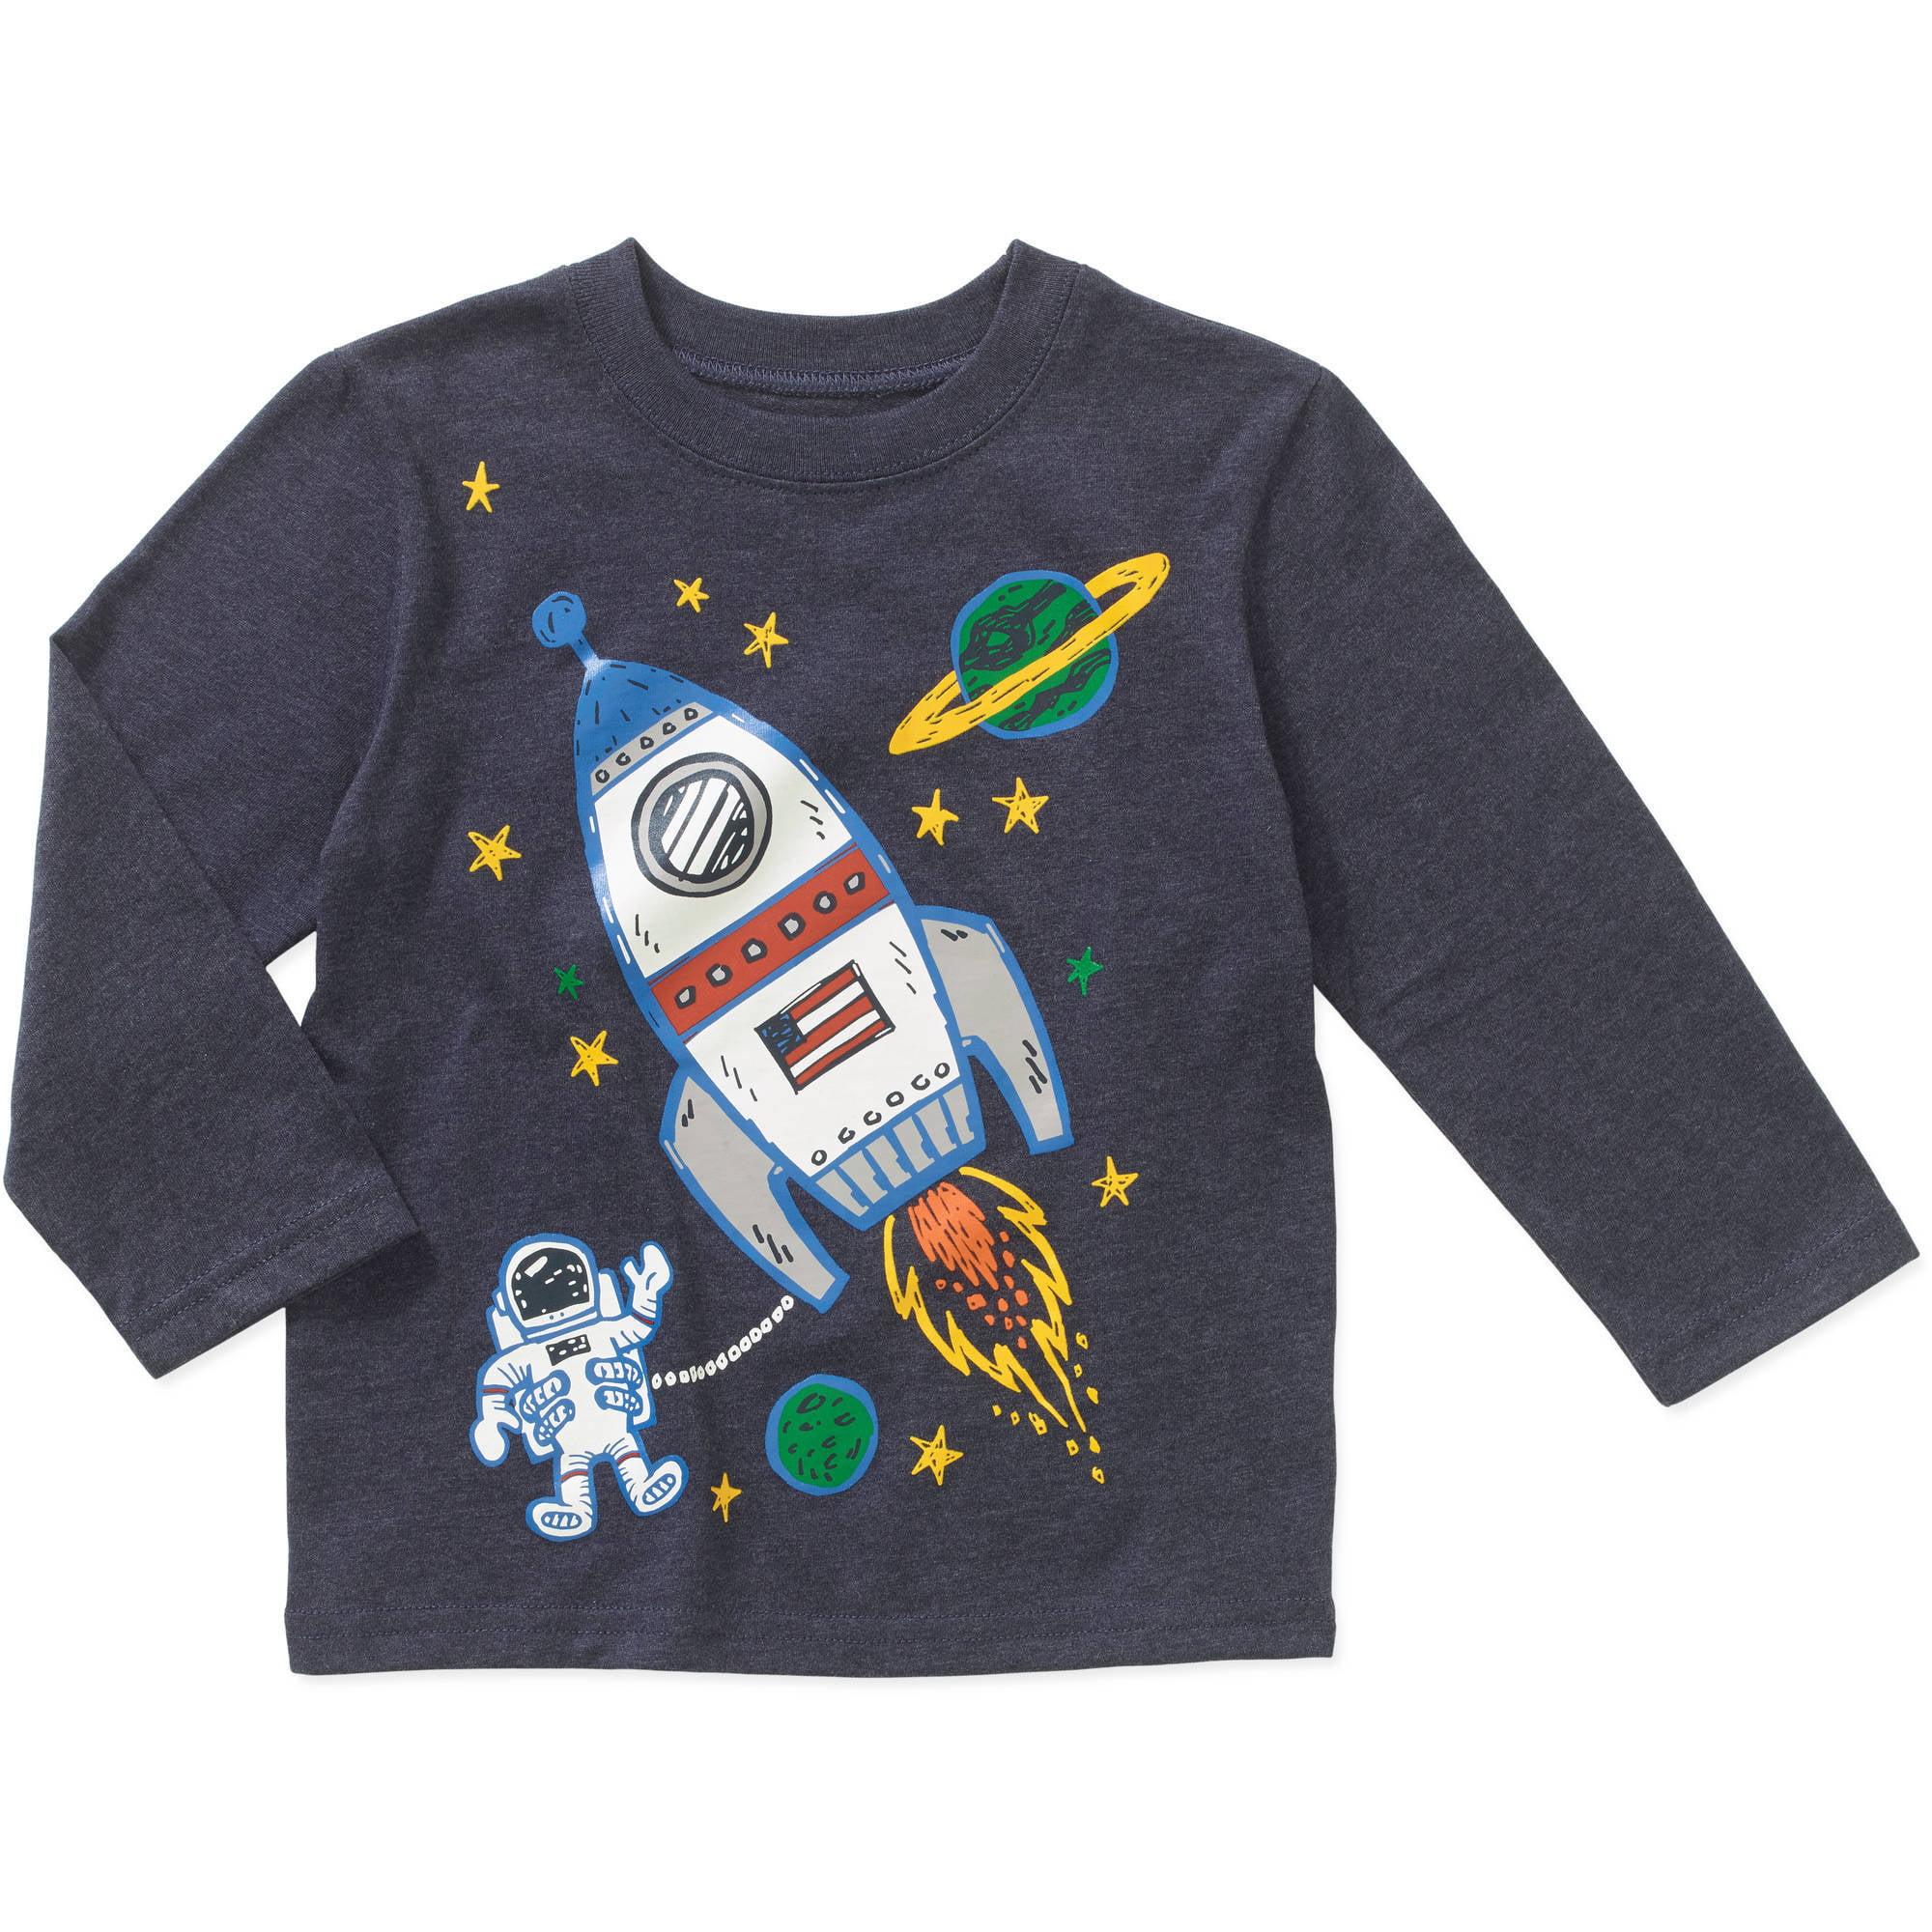 Garanimals Baby Toddler Boys' Long Sleeve Graphic Tee Shirt